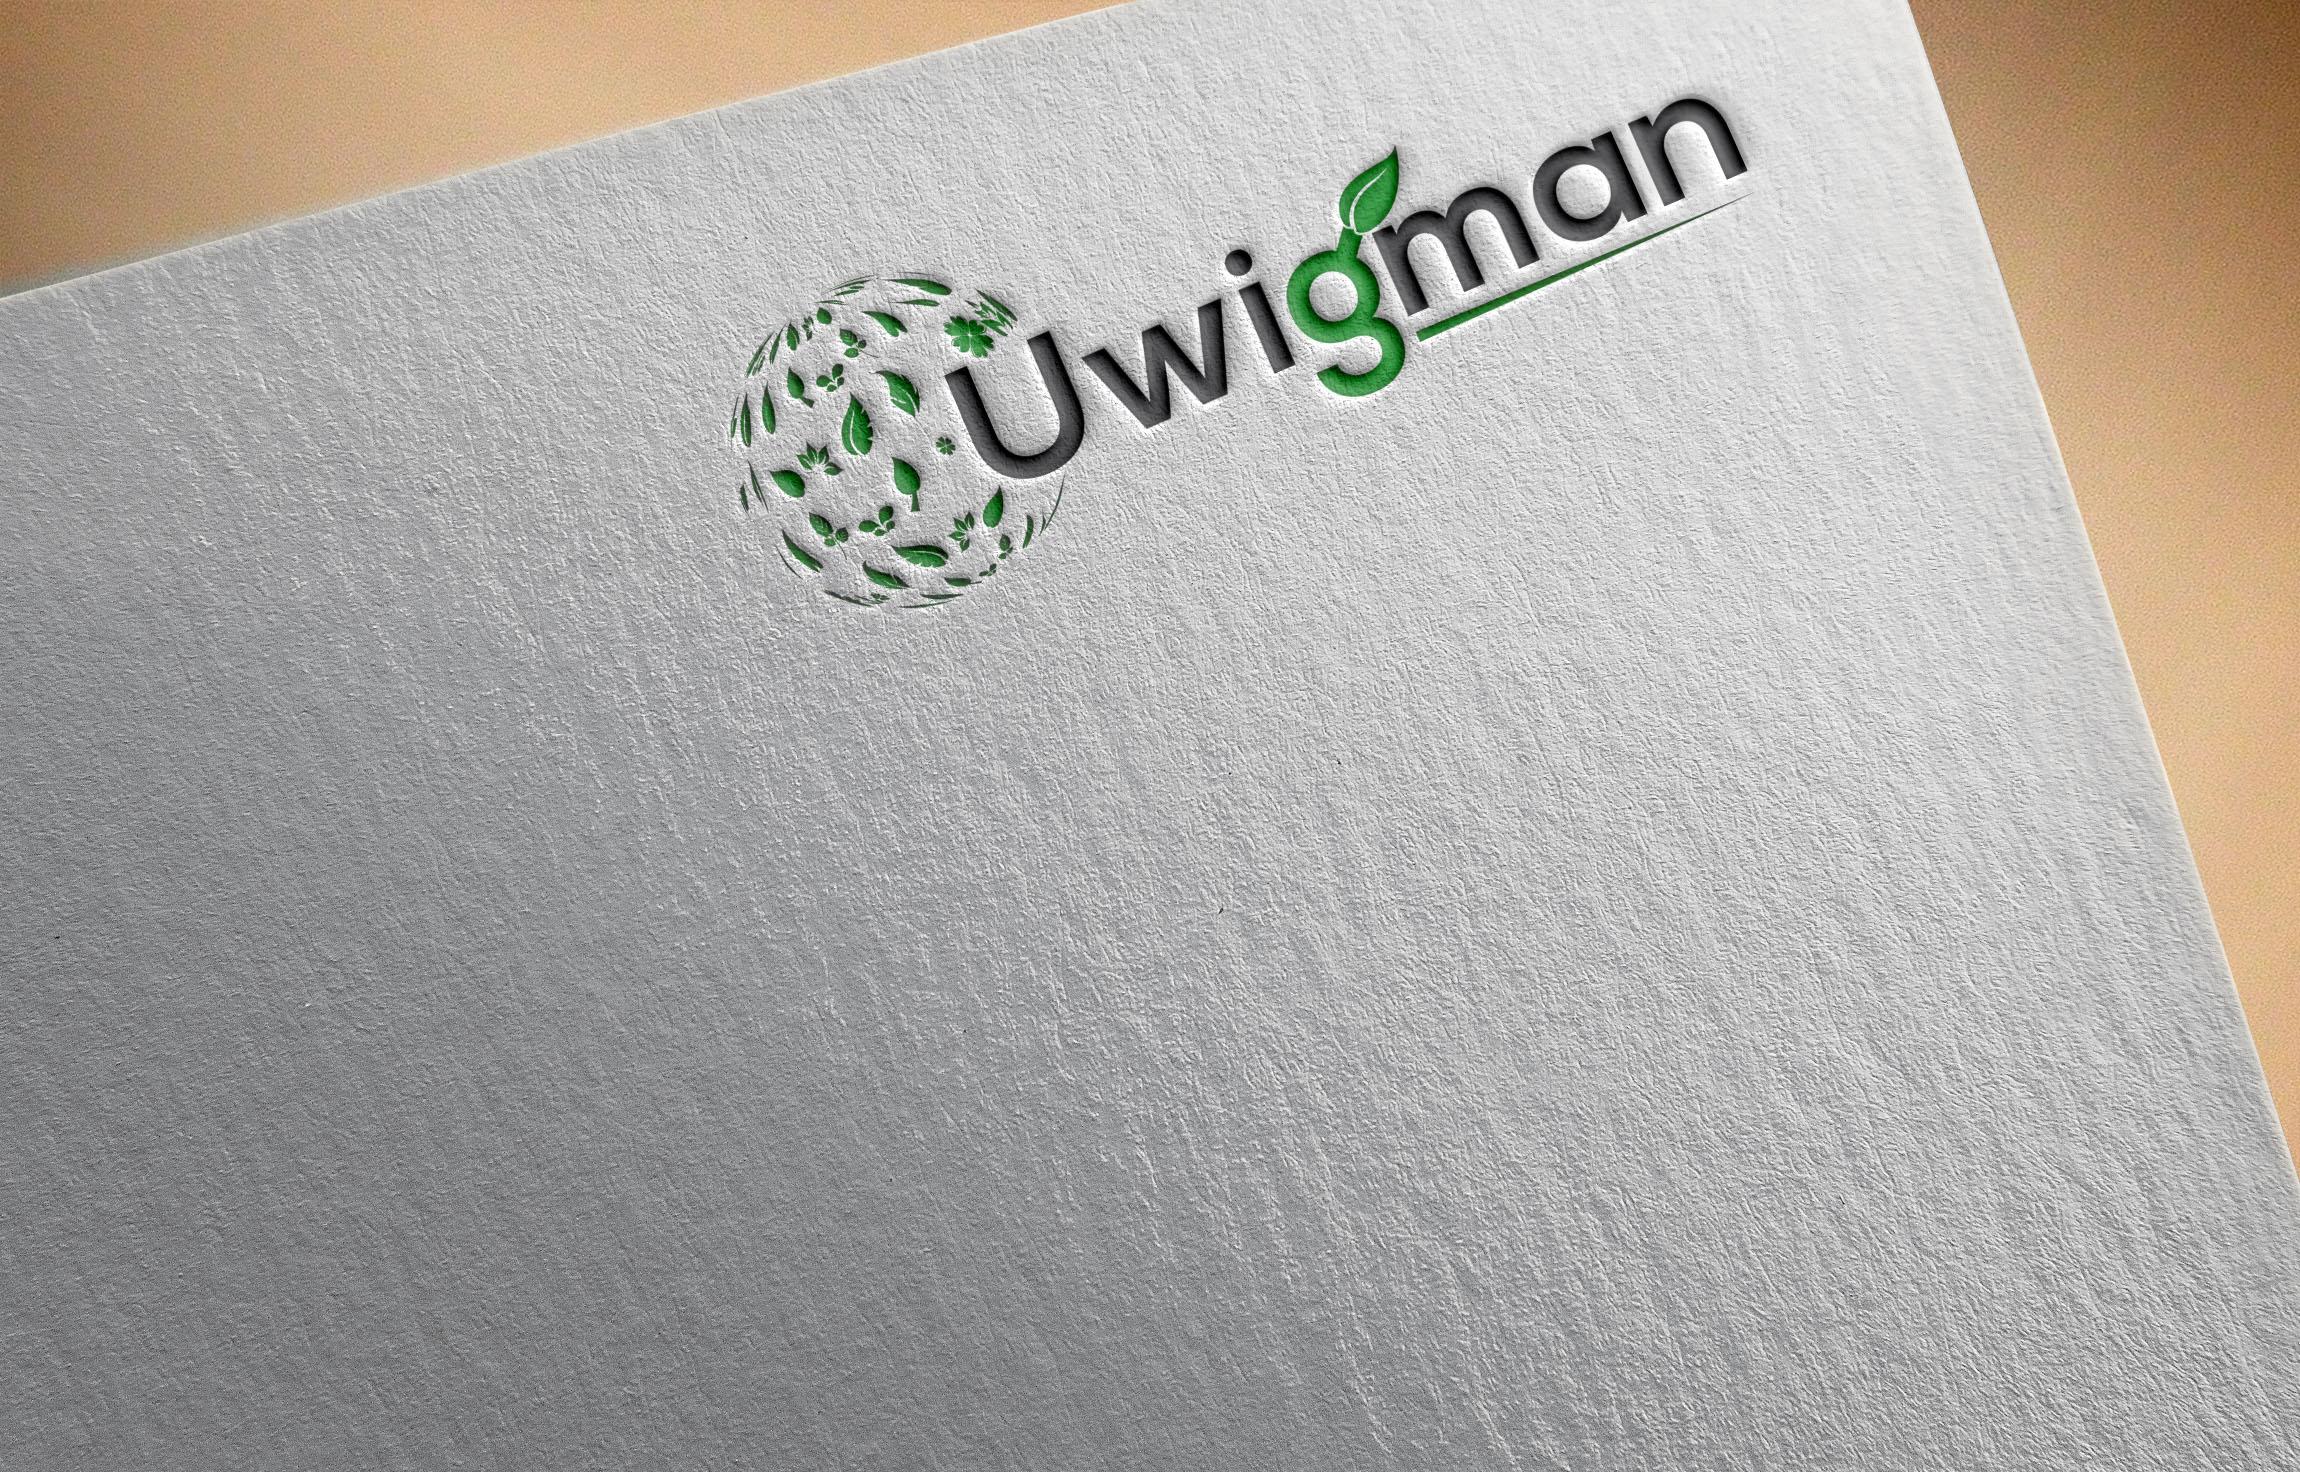 I can make your company logo